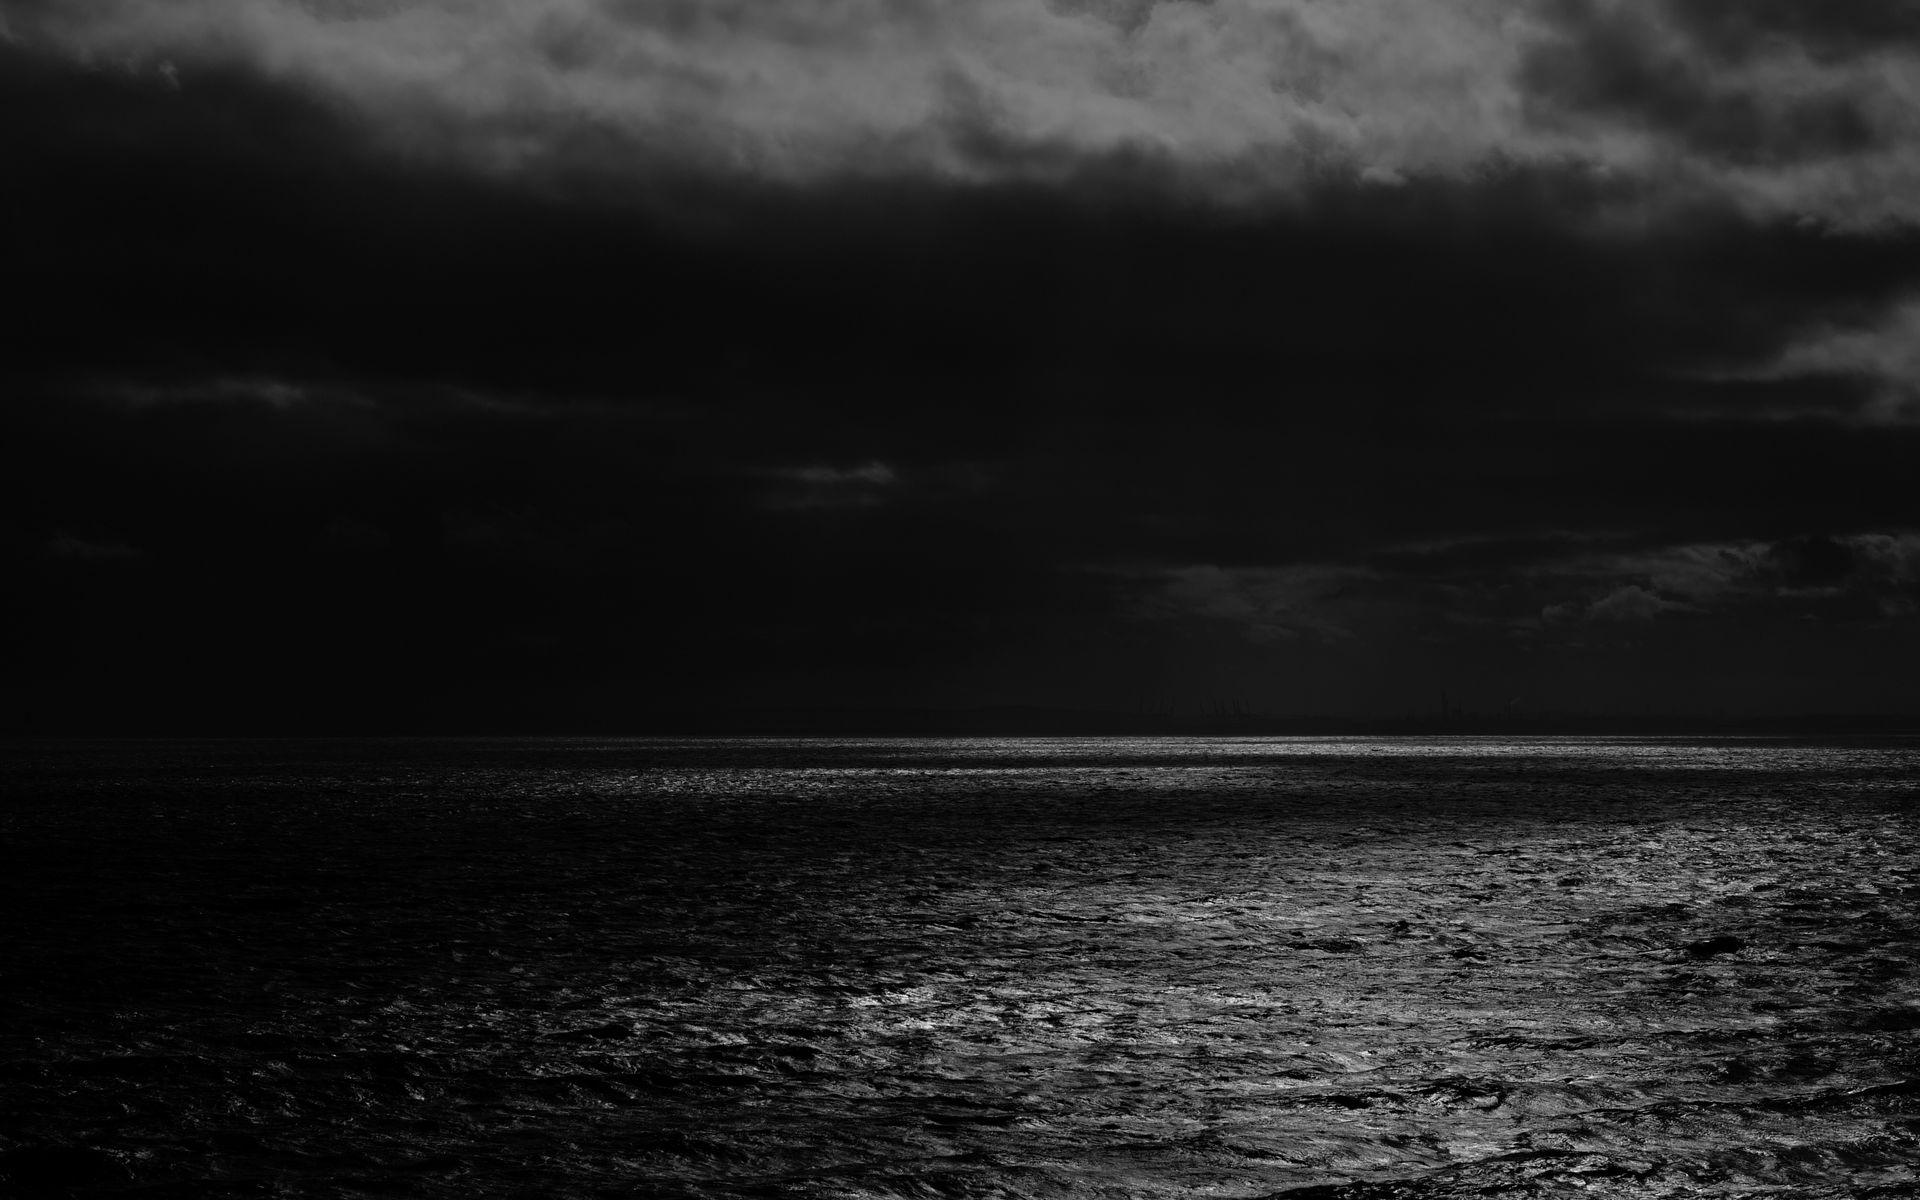 1920x1200 Wallpaper sea, horizon, bw, overcast, clouds, ripples